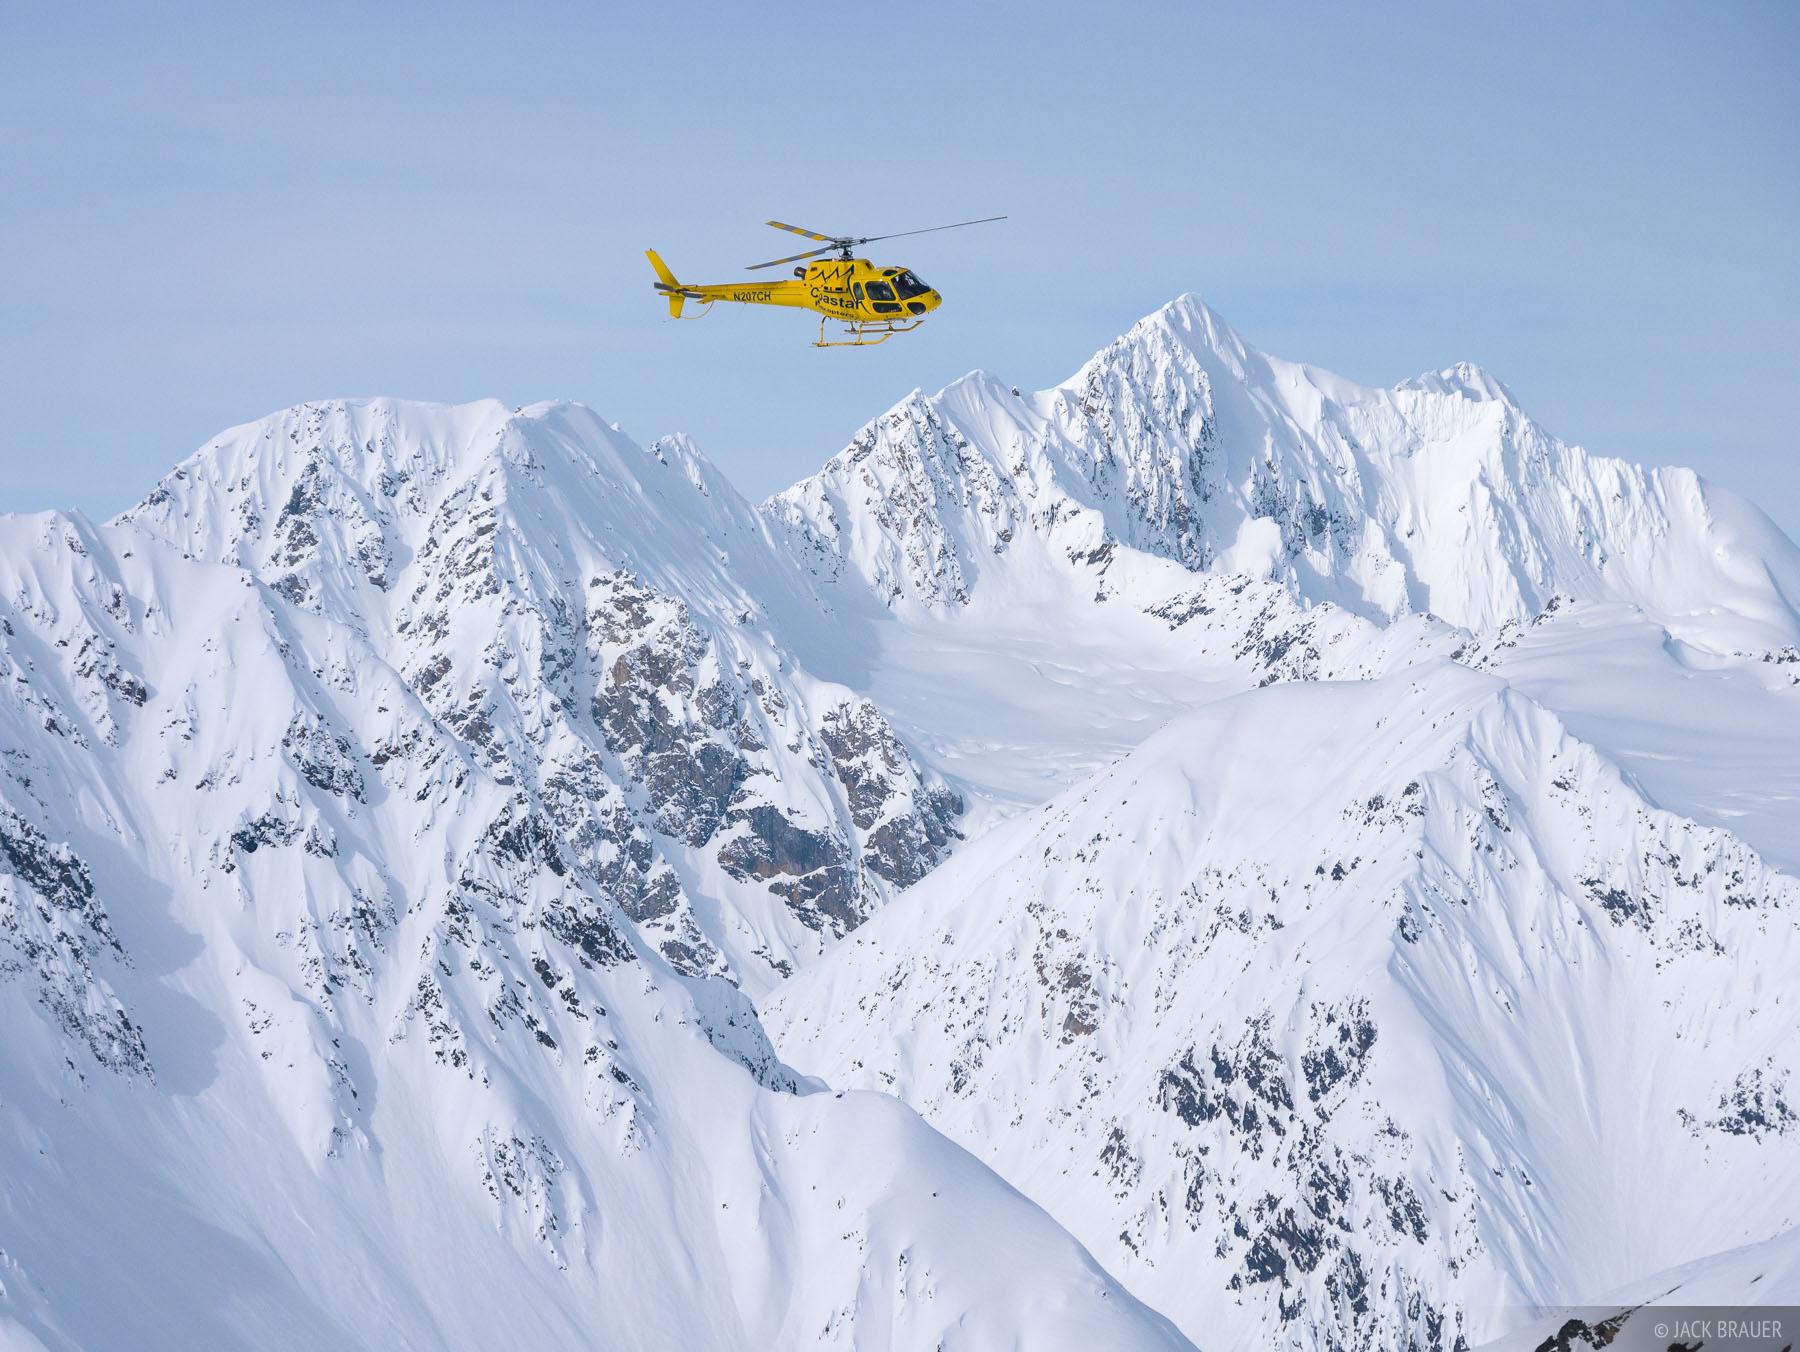 Alaska, Haines, helicopter, Takhinsha Mountains, March, Takhinsha, winter, 2016